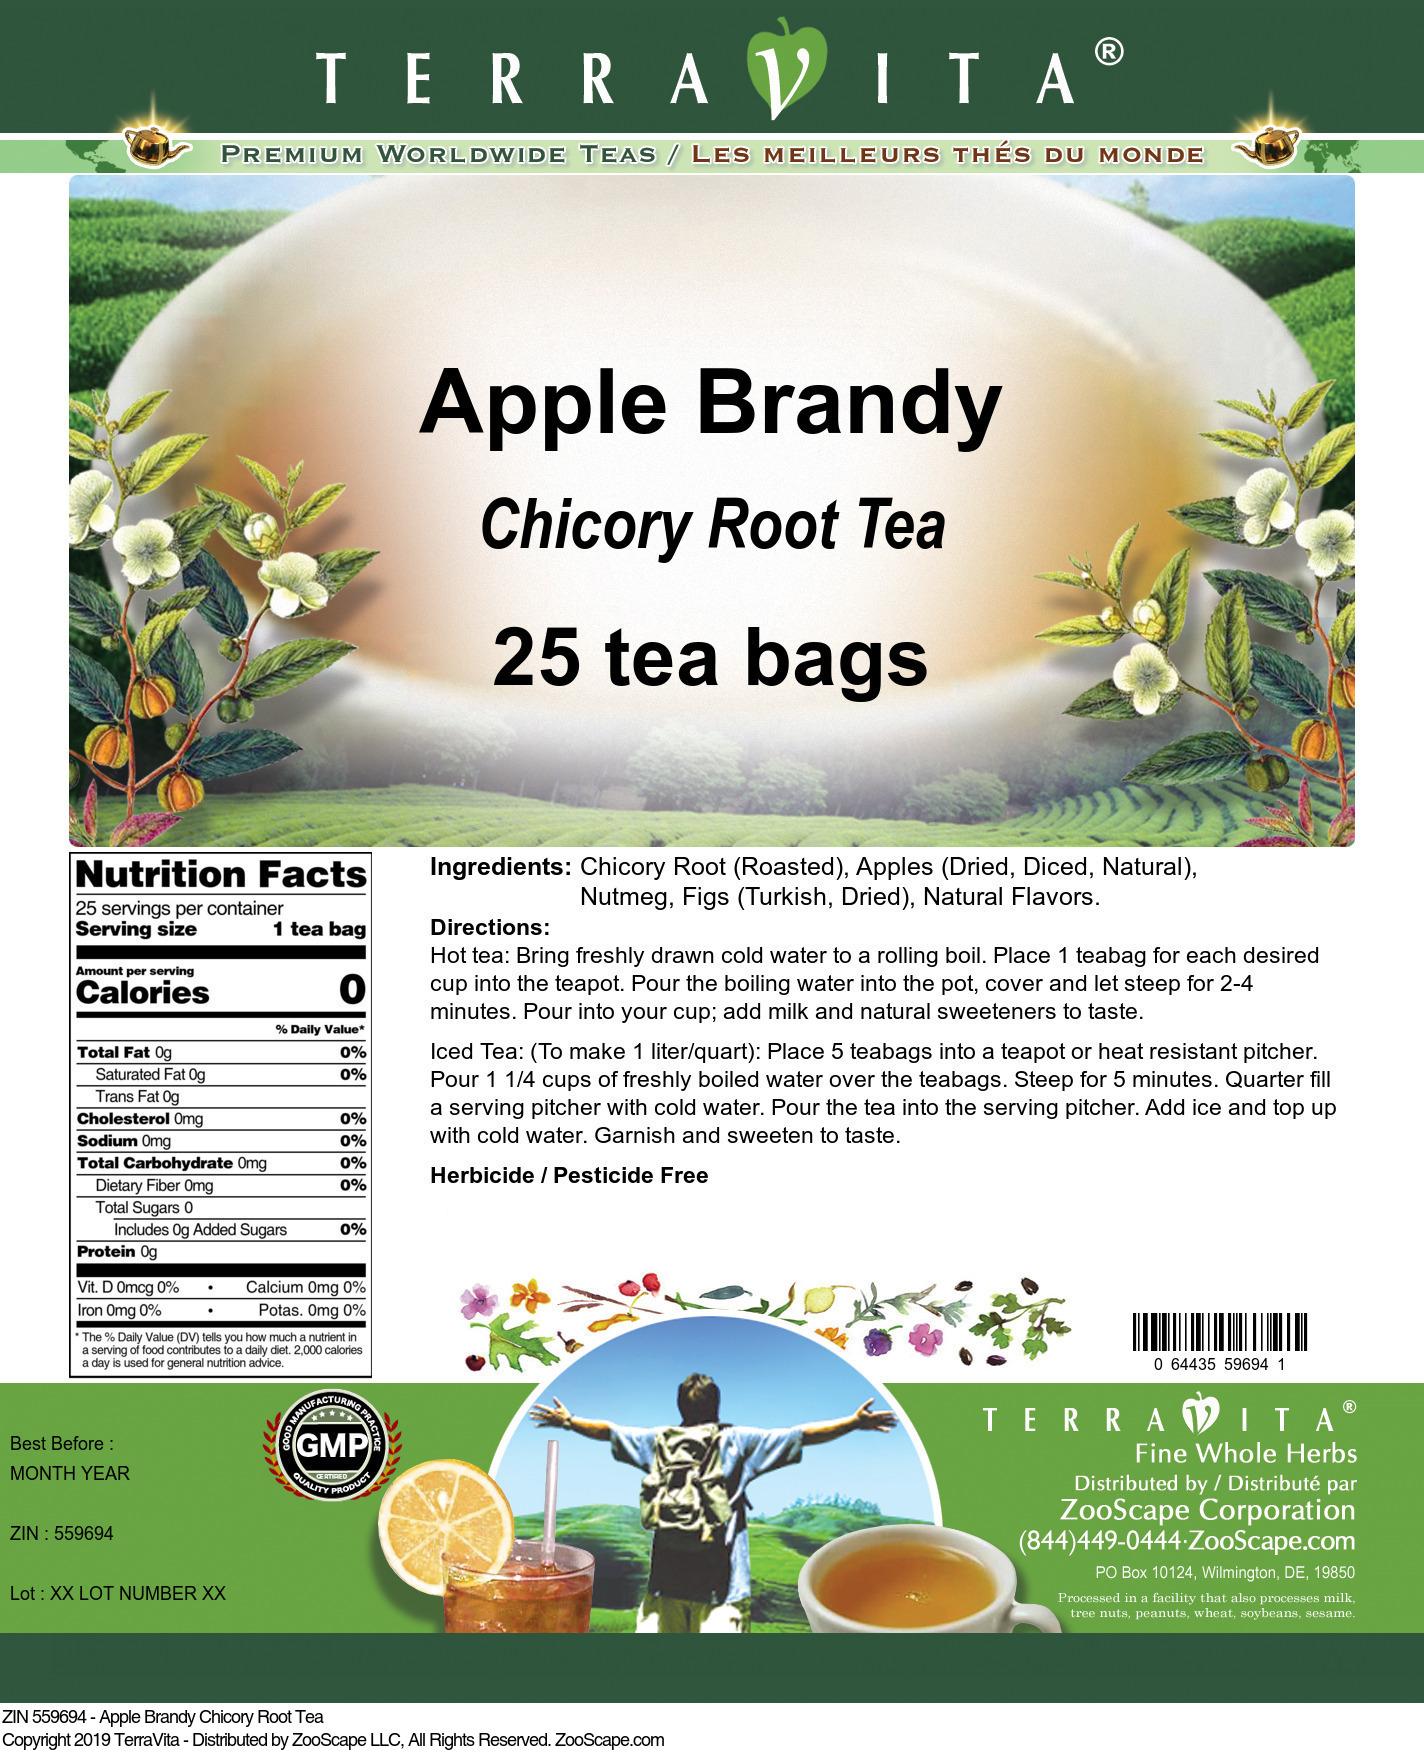 Apple Brandy Chicory Root